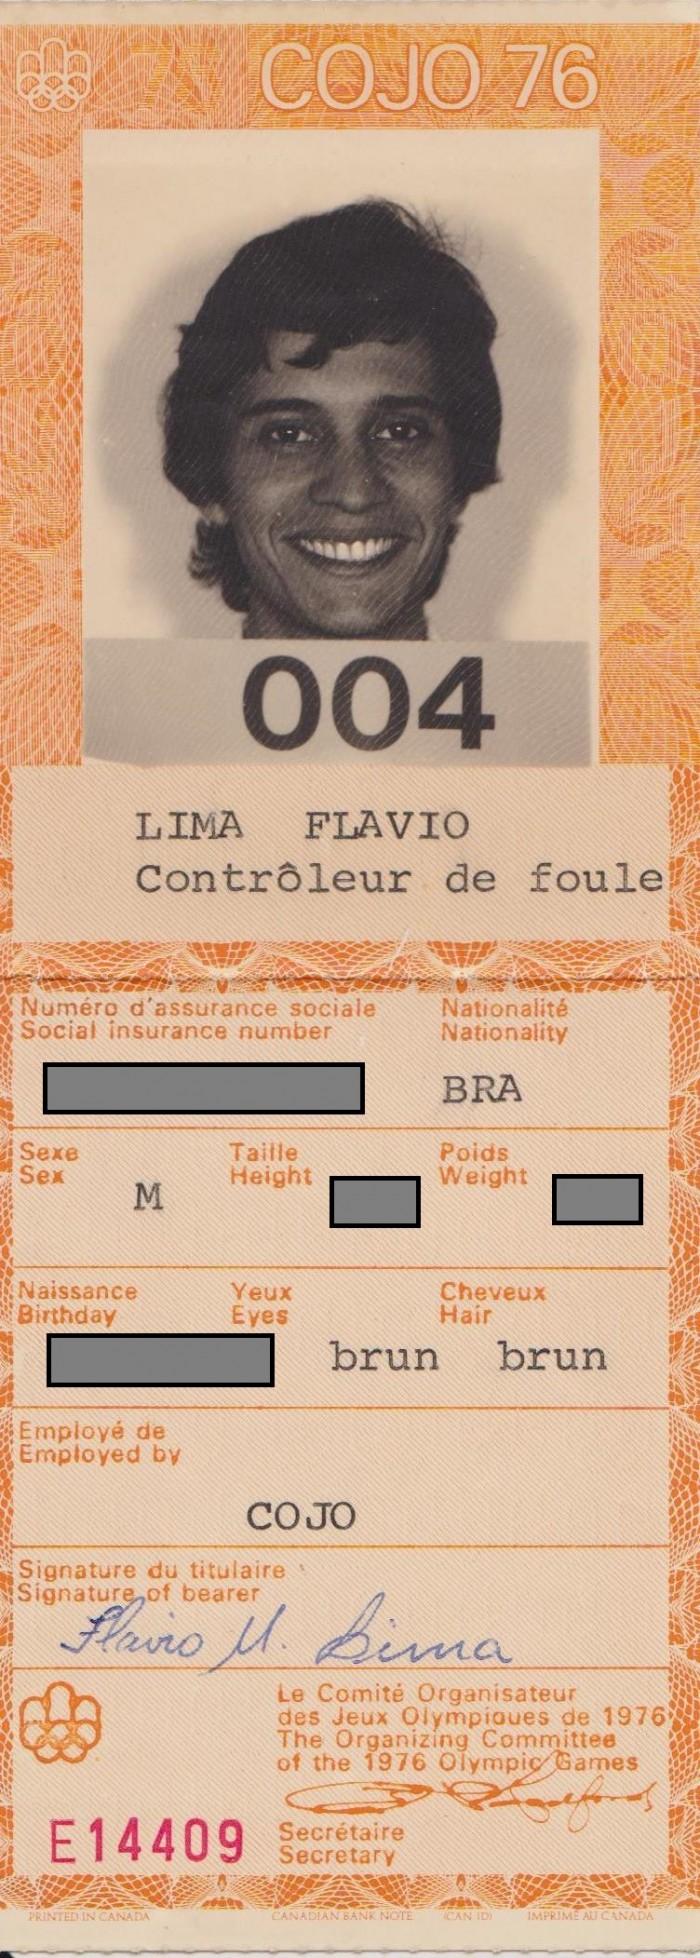 Crachá Jeux Olympiques 1976